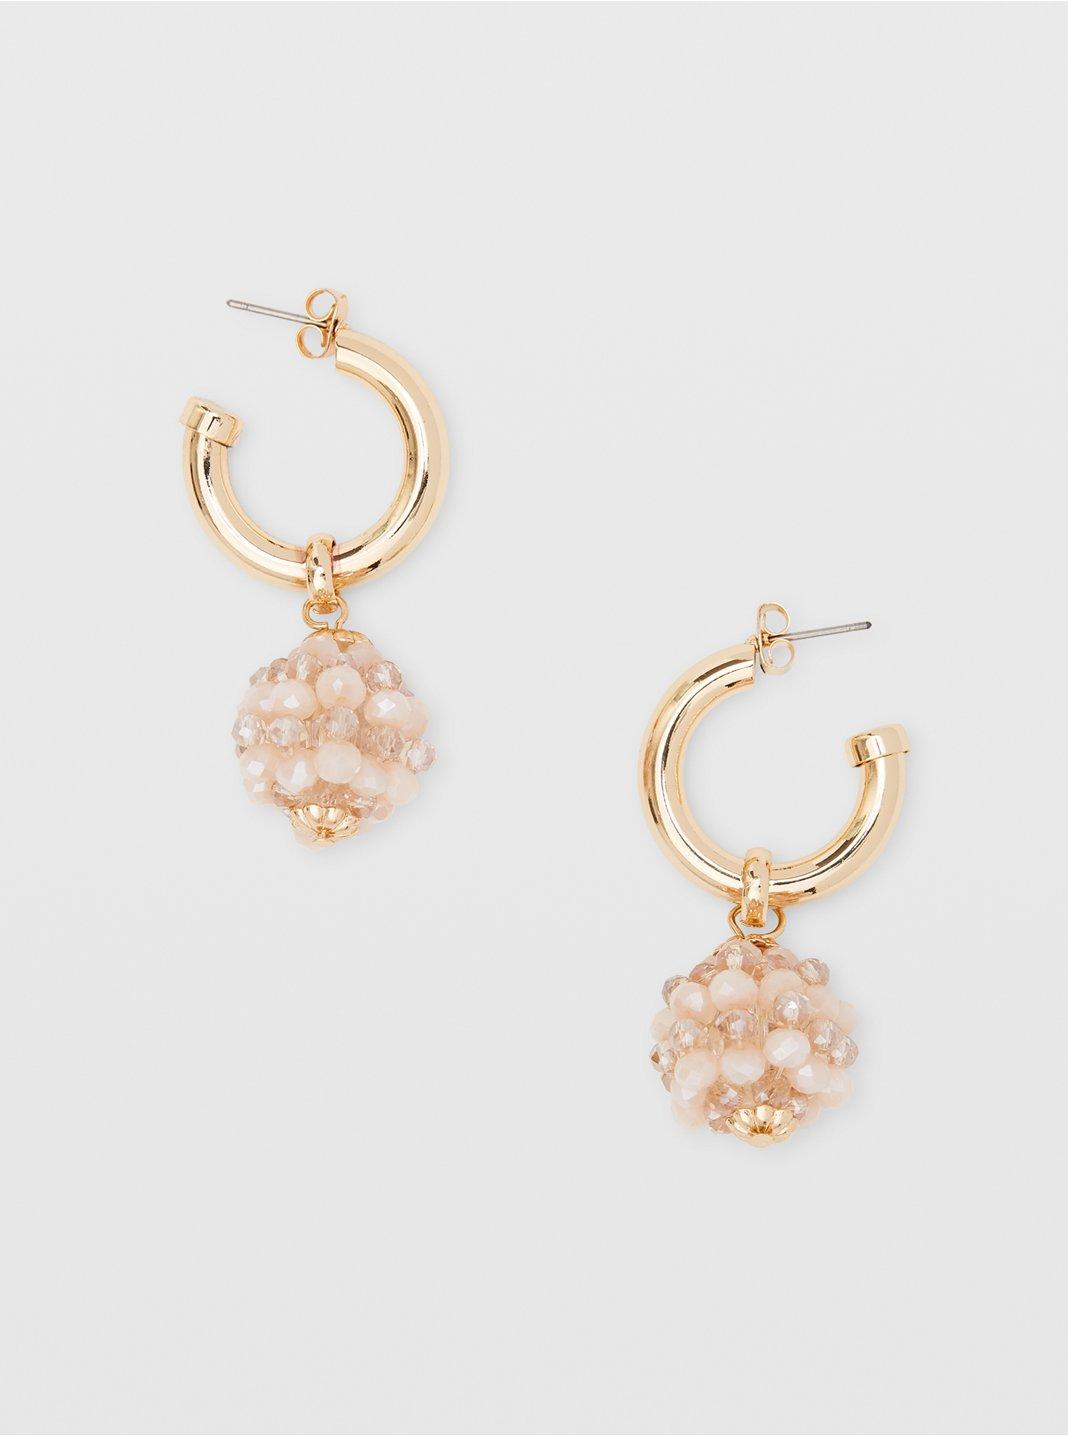 Bead Charm Earrings